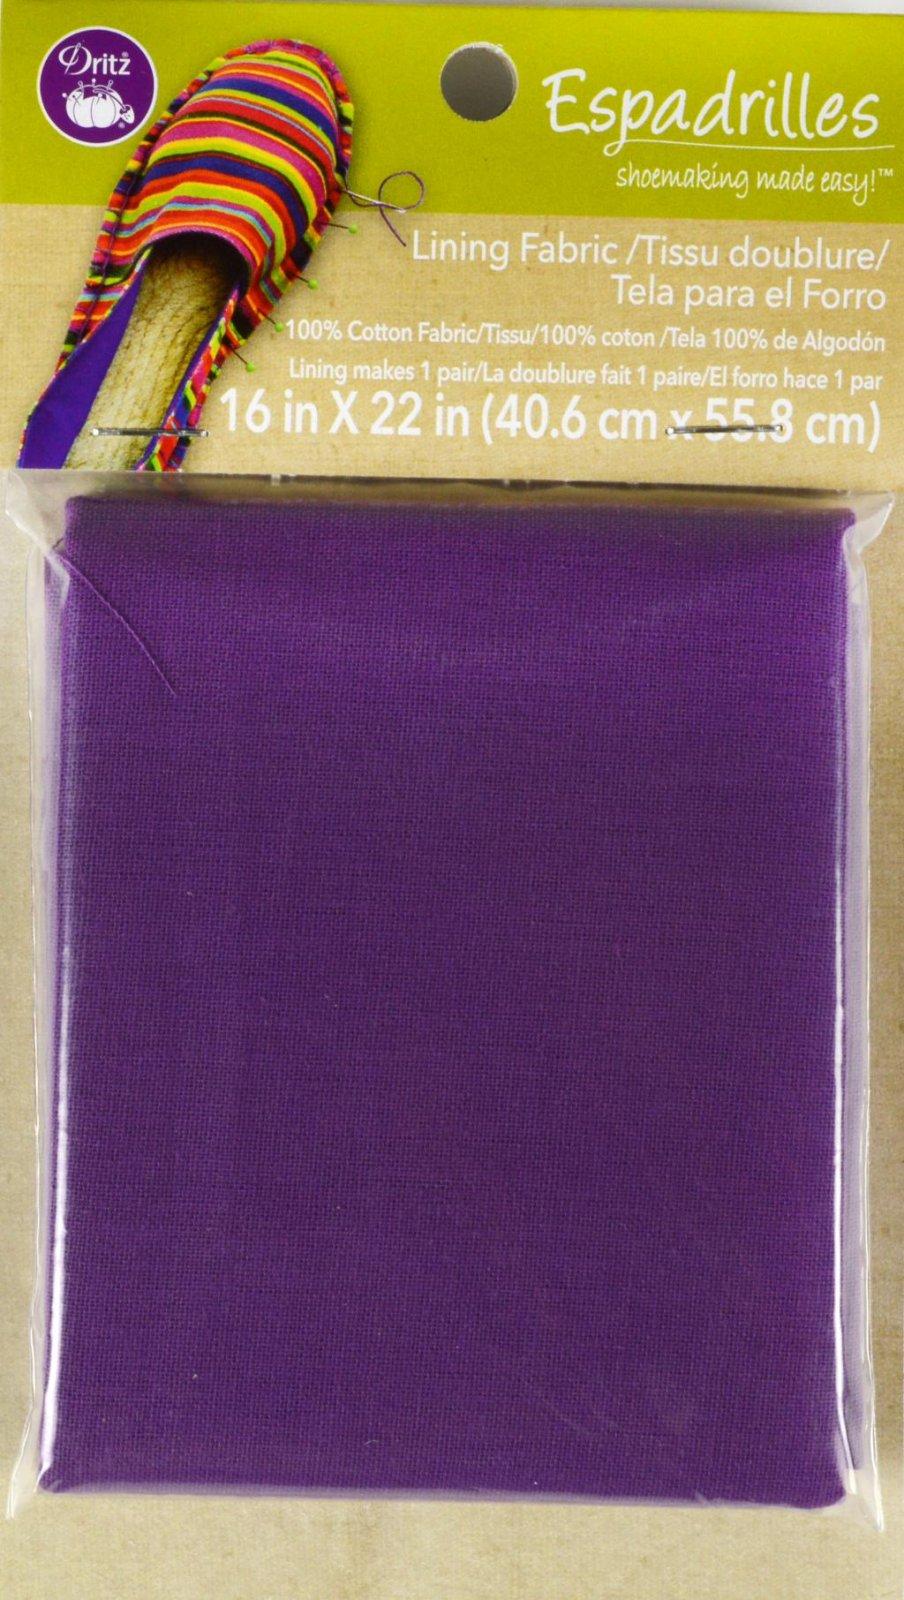 Espadrilles Lining Fabric Purple